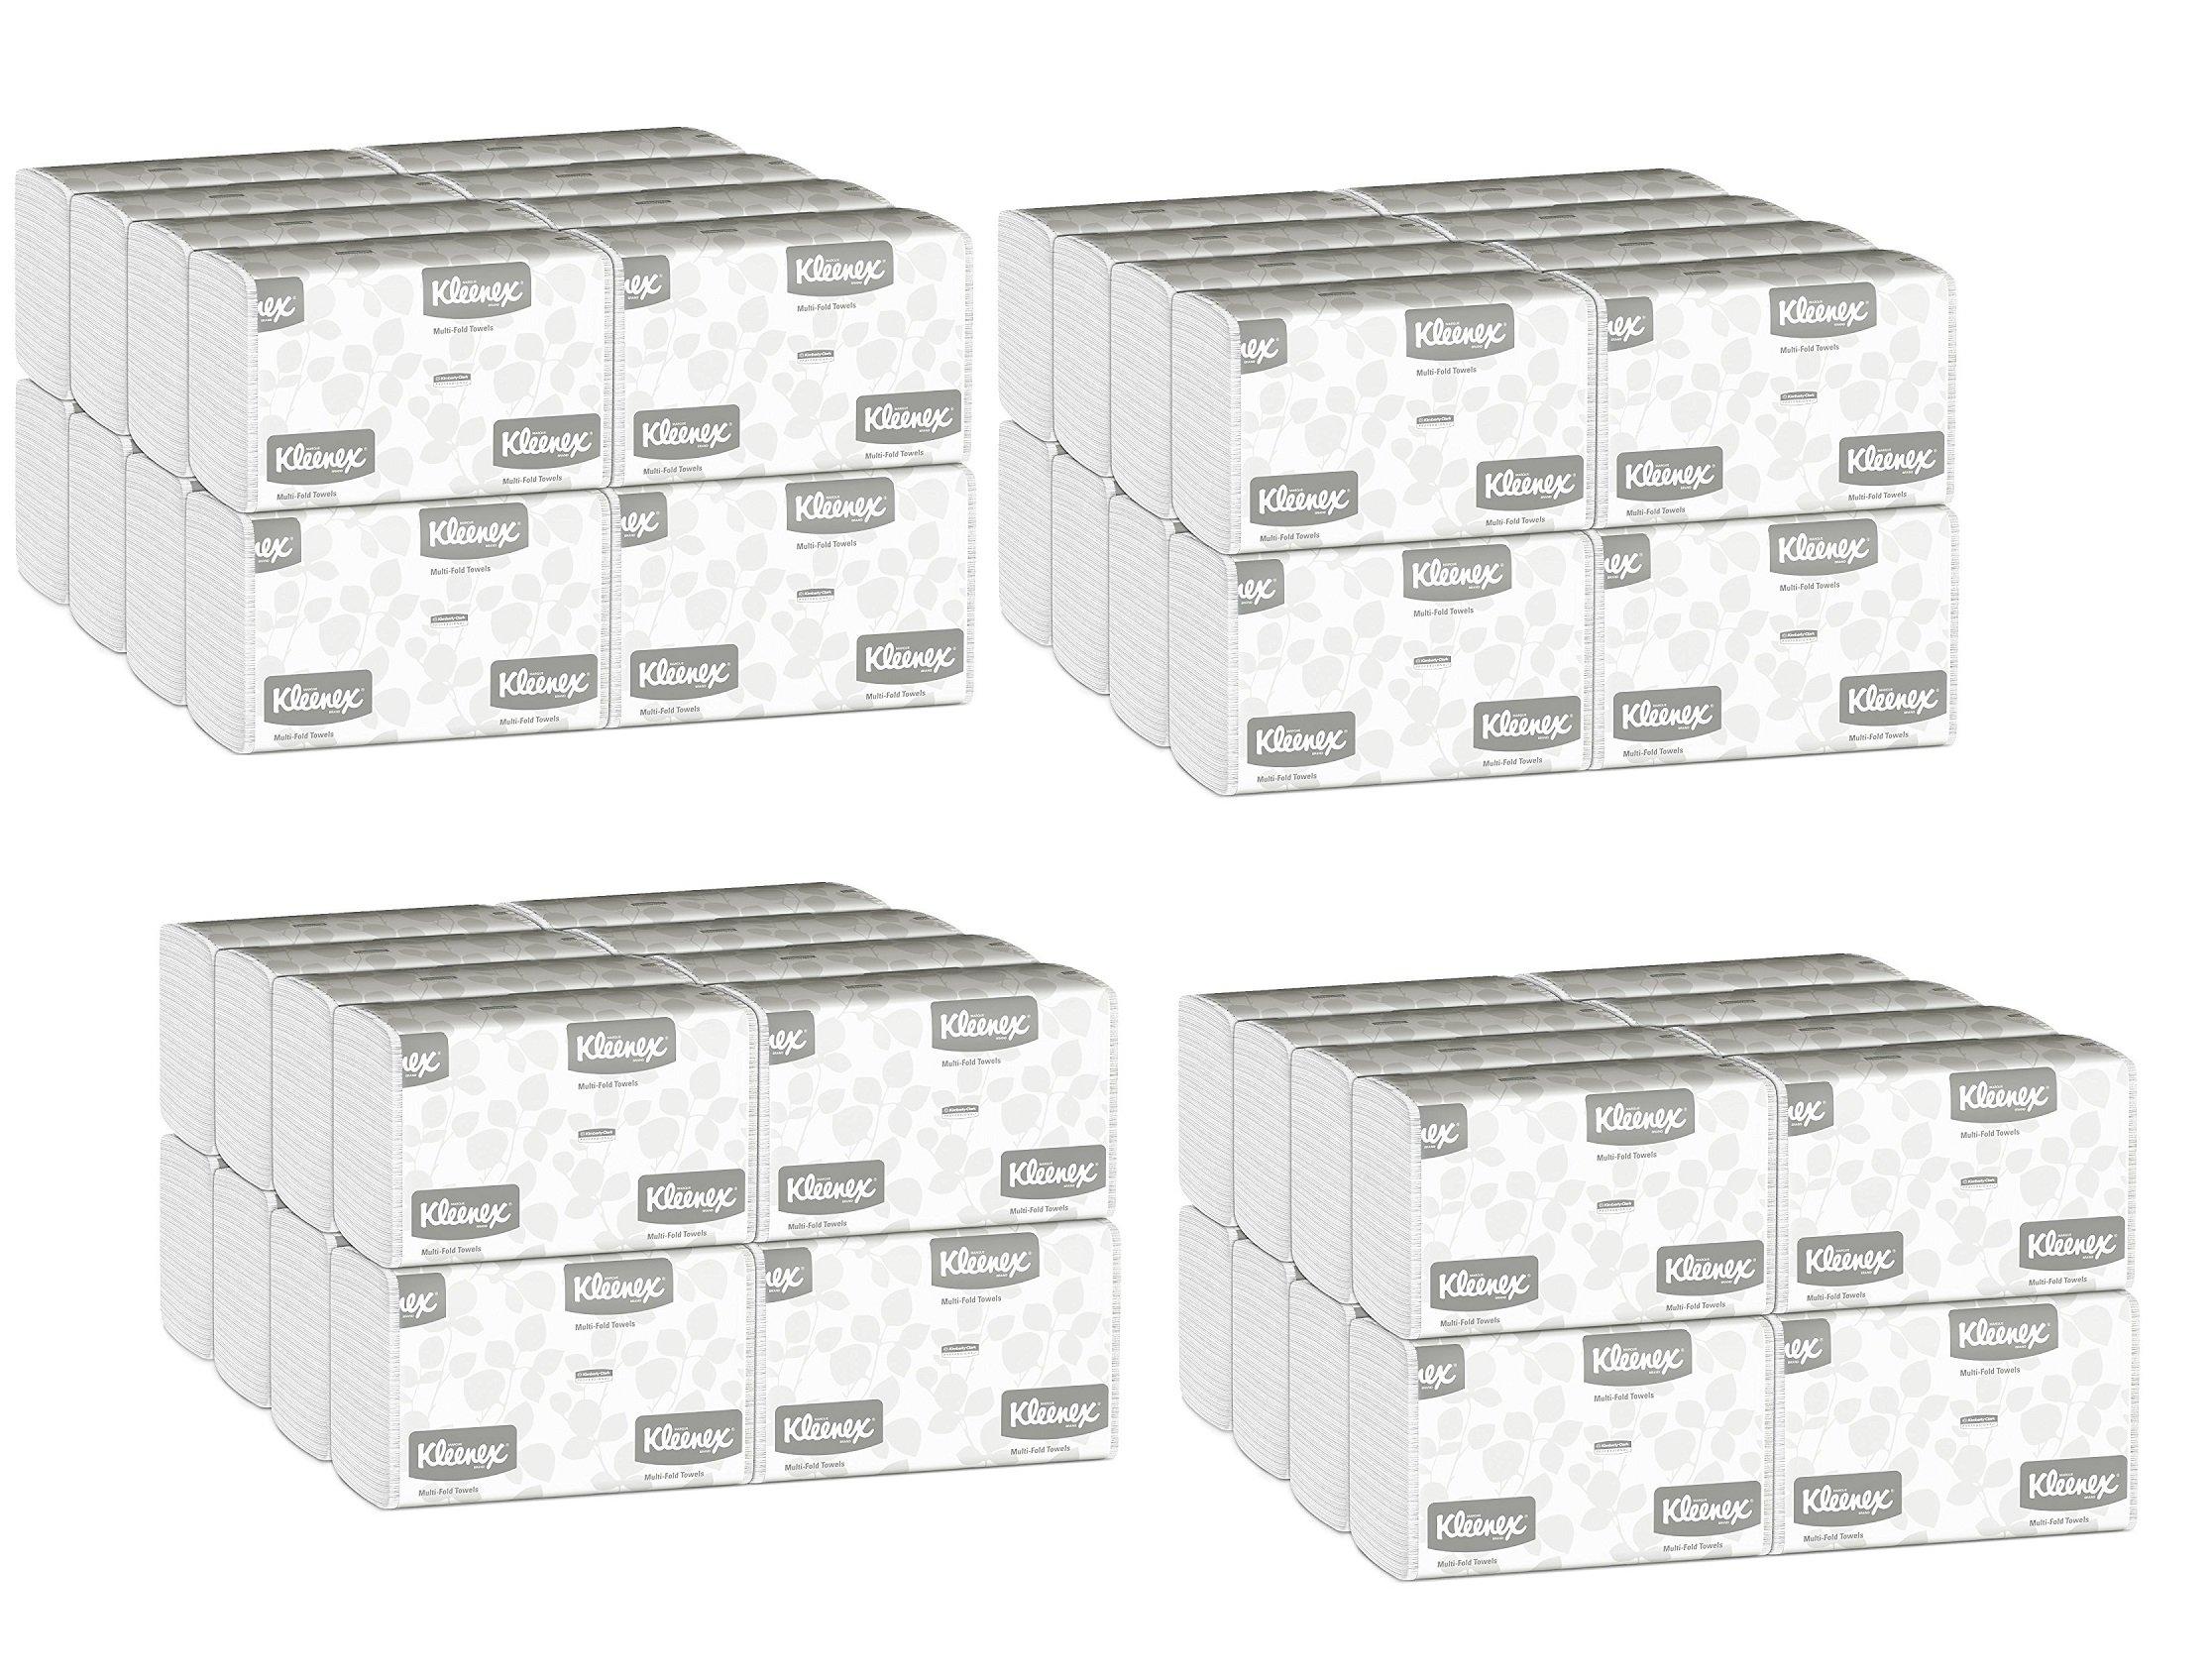 Kleenex Multifold Paper Towels (01890), White, Case of 64 Packs xpzjQa, 150 Tri Fold Paper Towels per Pack